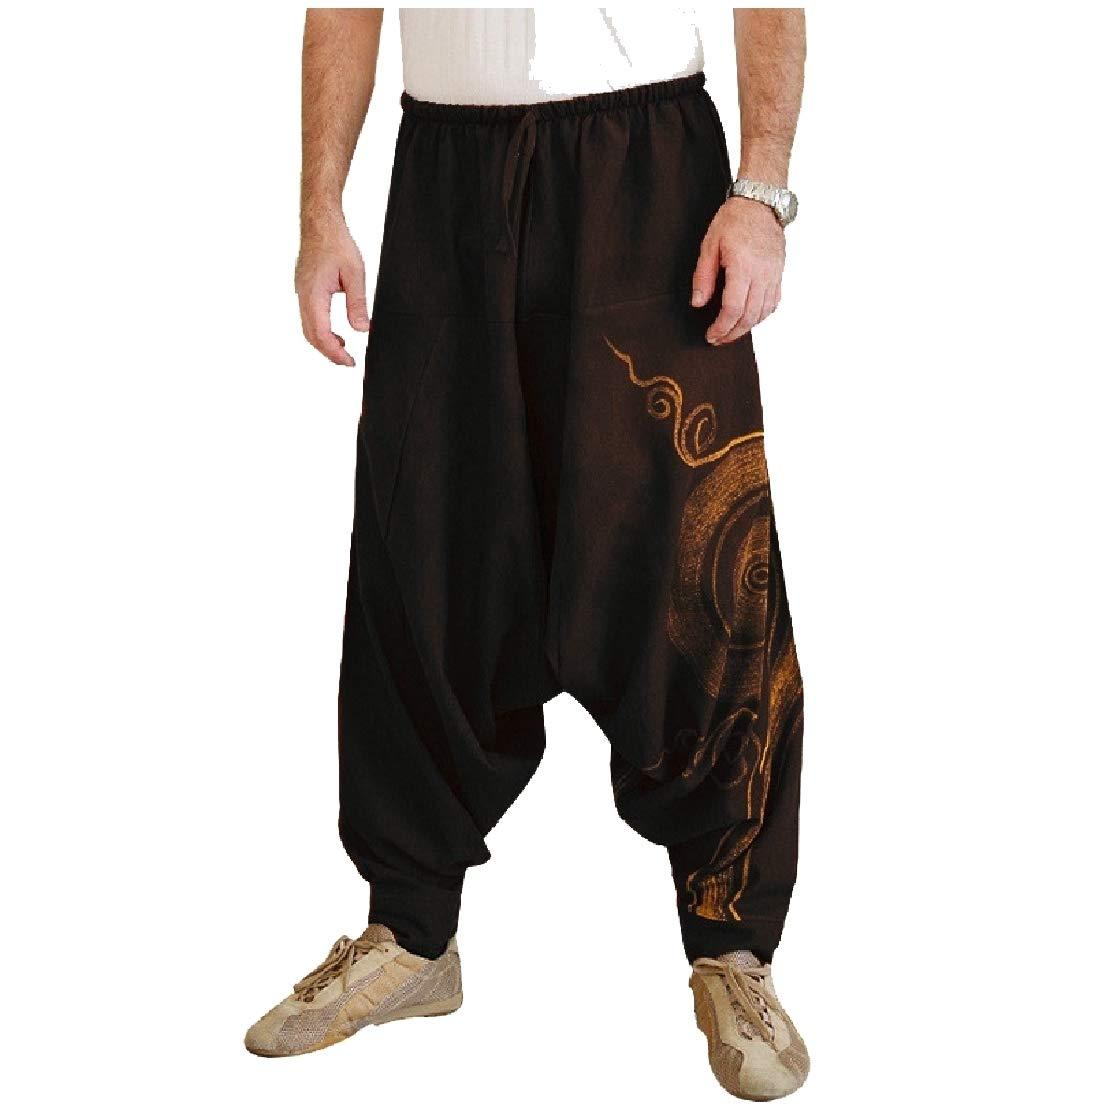 YUNY Mens Hip Hop Loose Floral Tribal Oversize Harem Casual Pants Black M